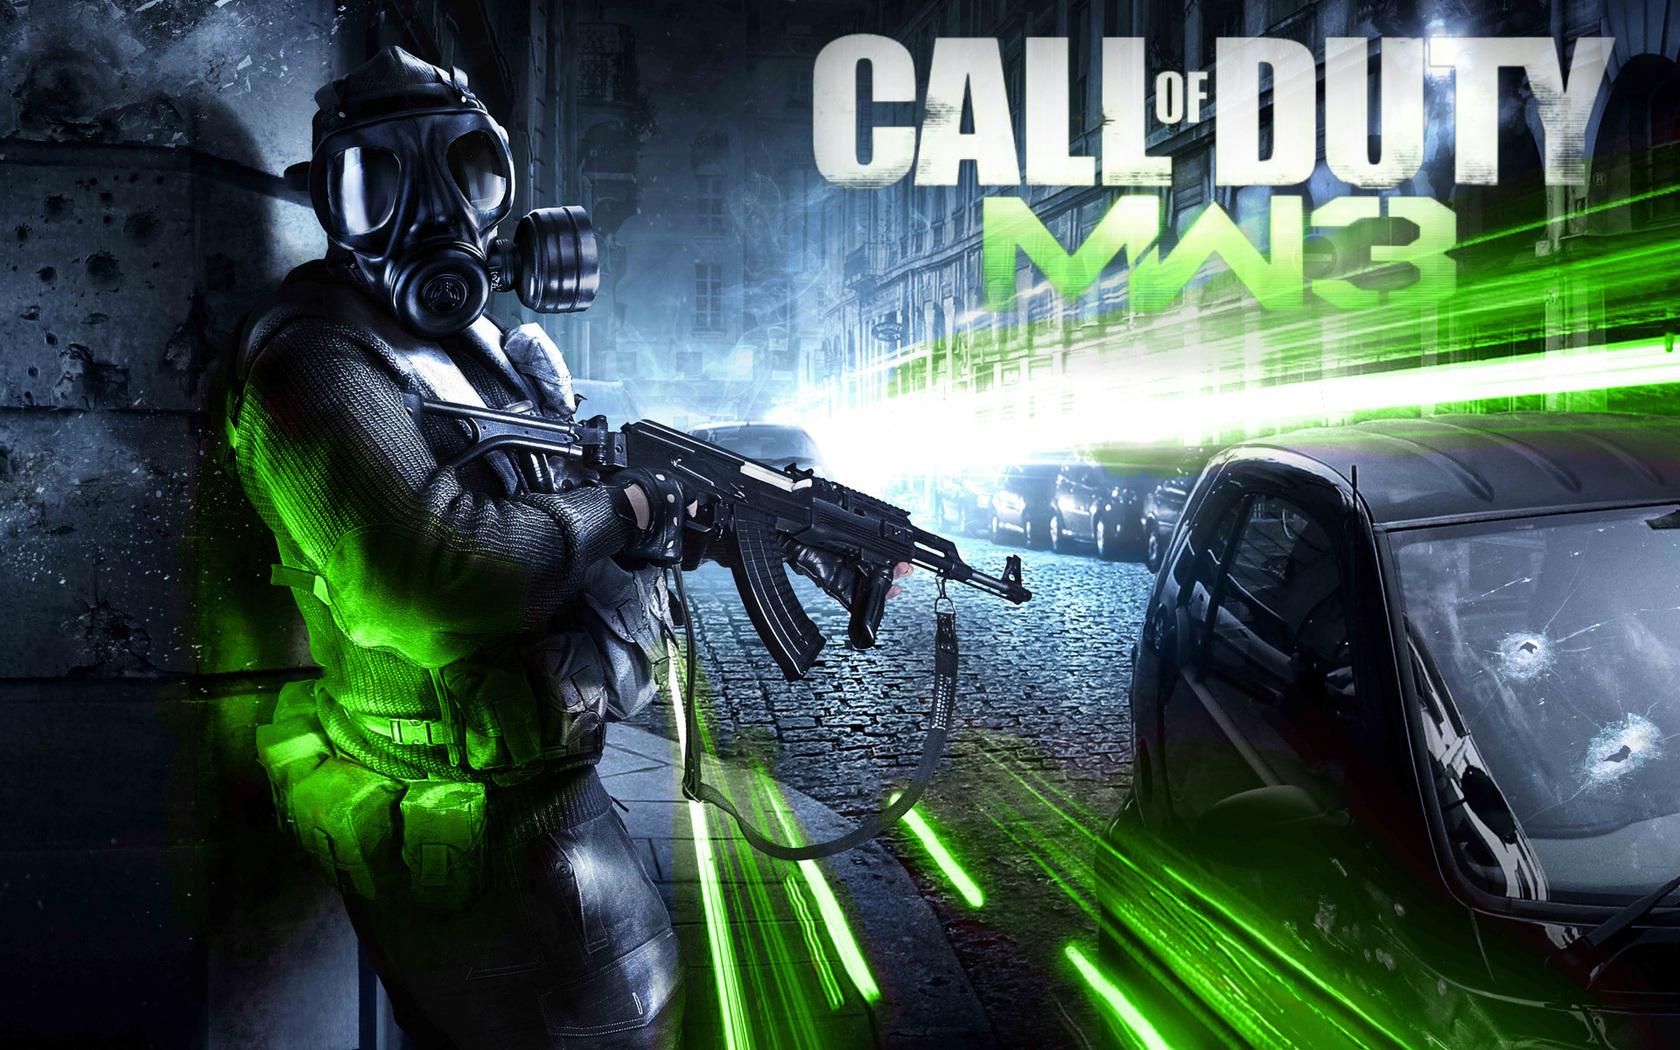 Call Of Duty Modern Warfare 3 Screen HD Wallpaper Games Wallpapers 1680x1050